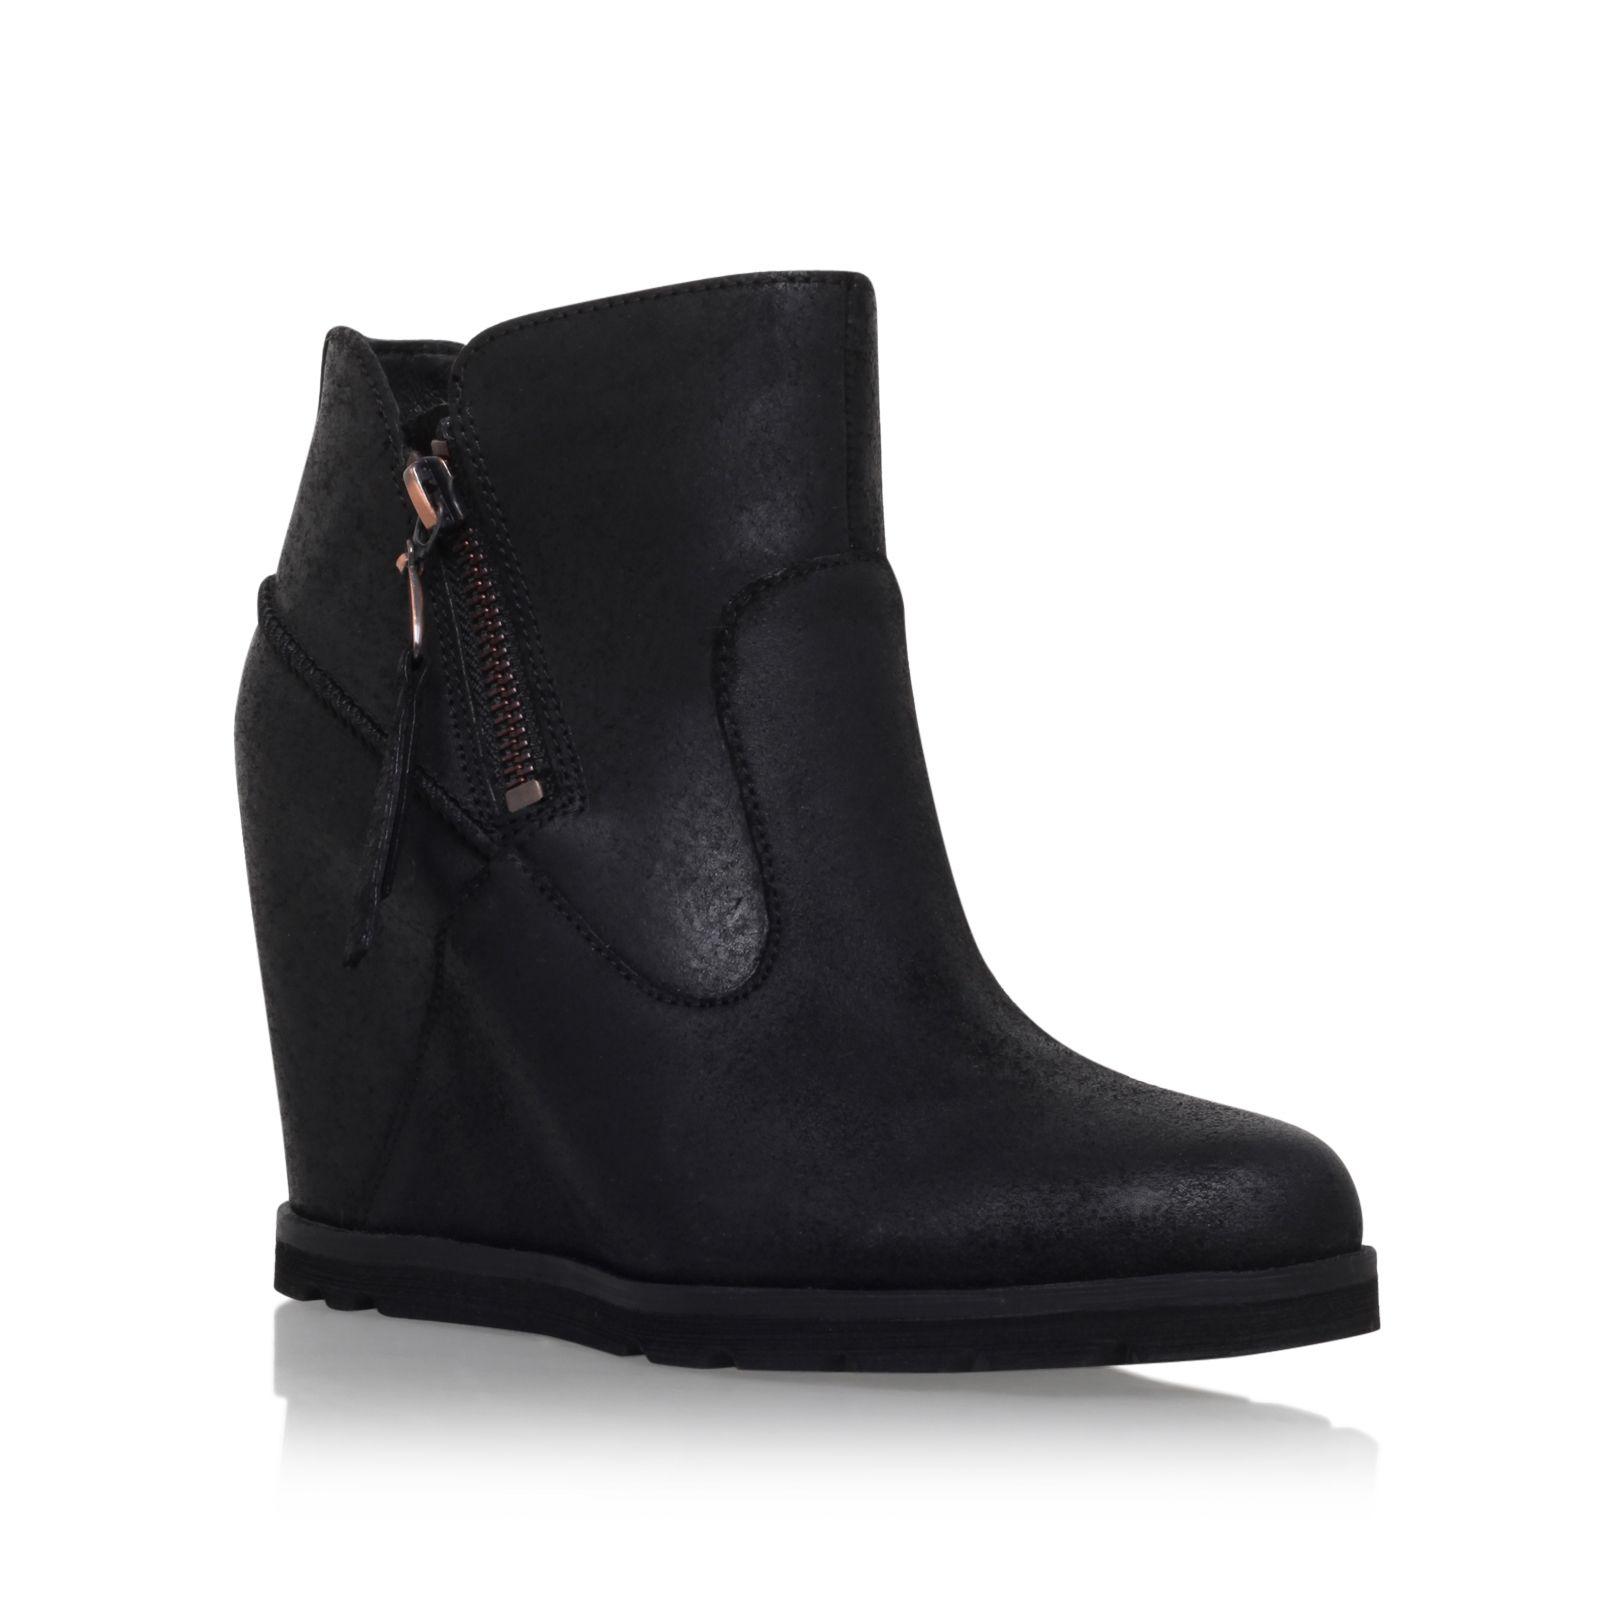 ugg myrna wedge heel ankle boots in black lyst